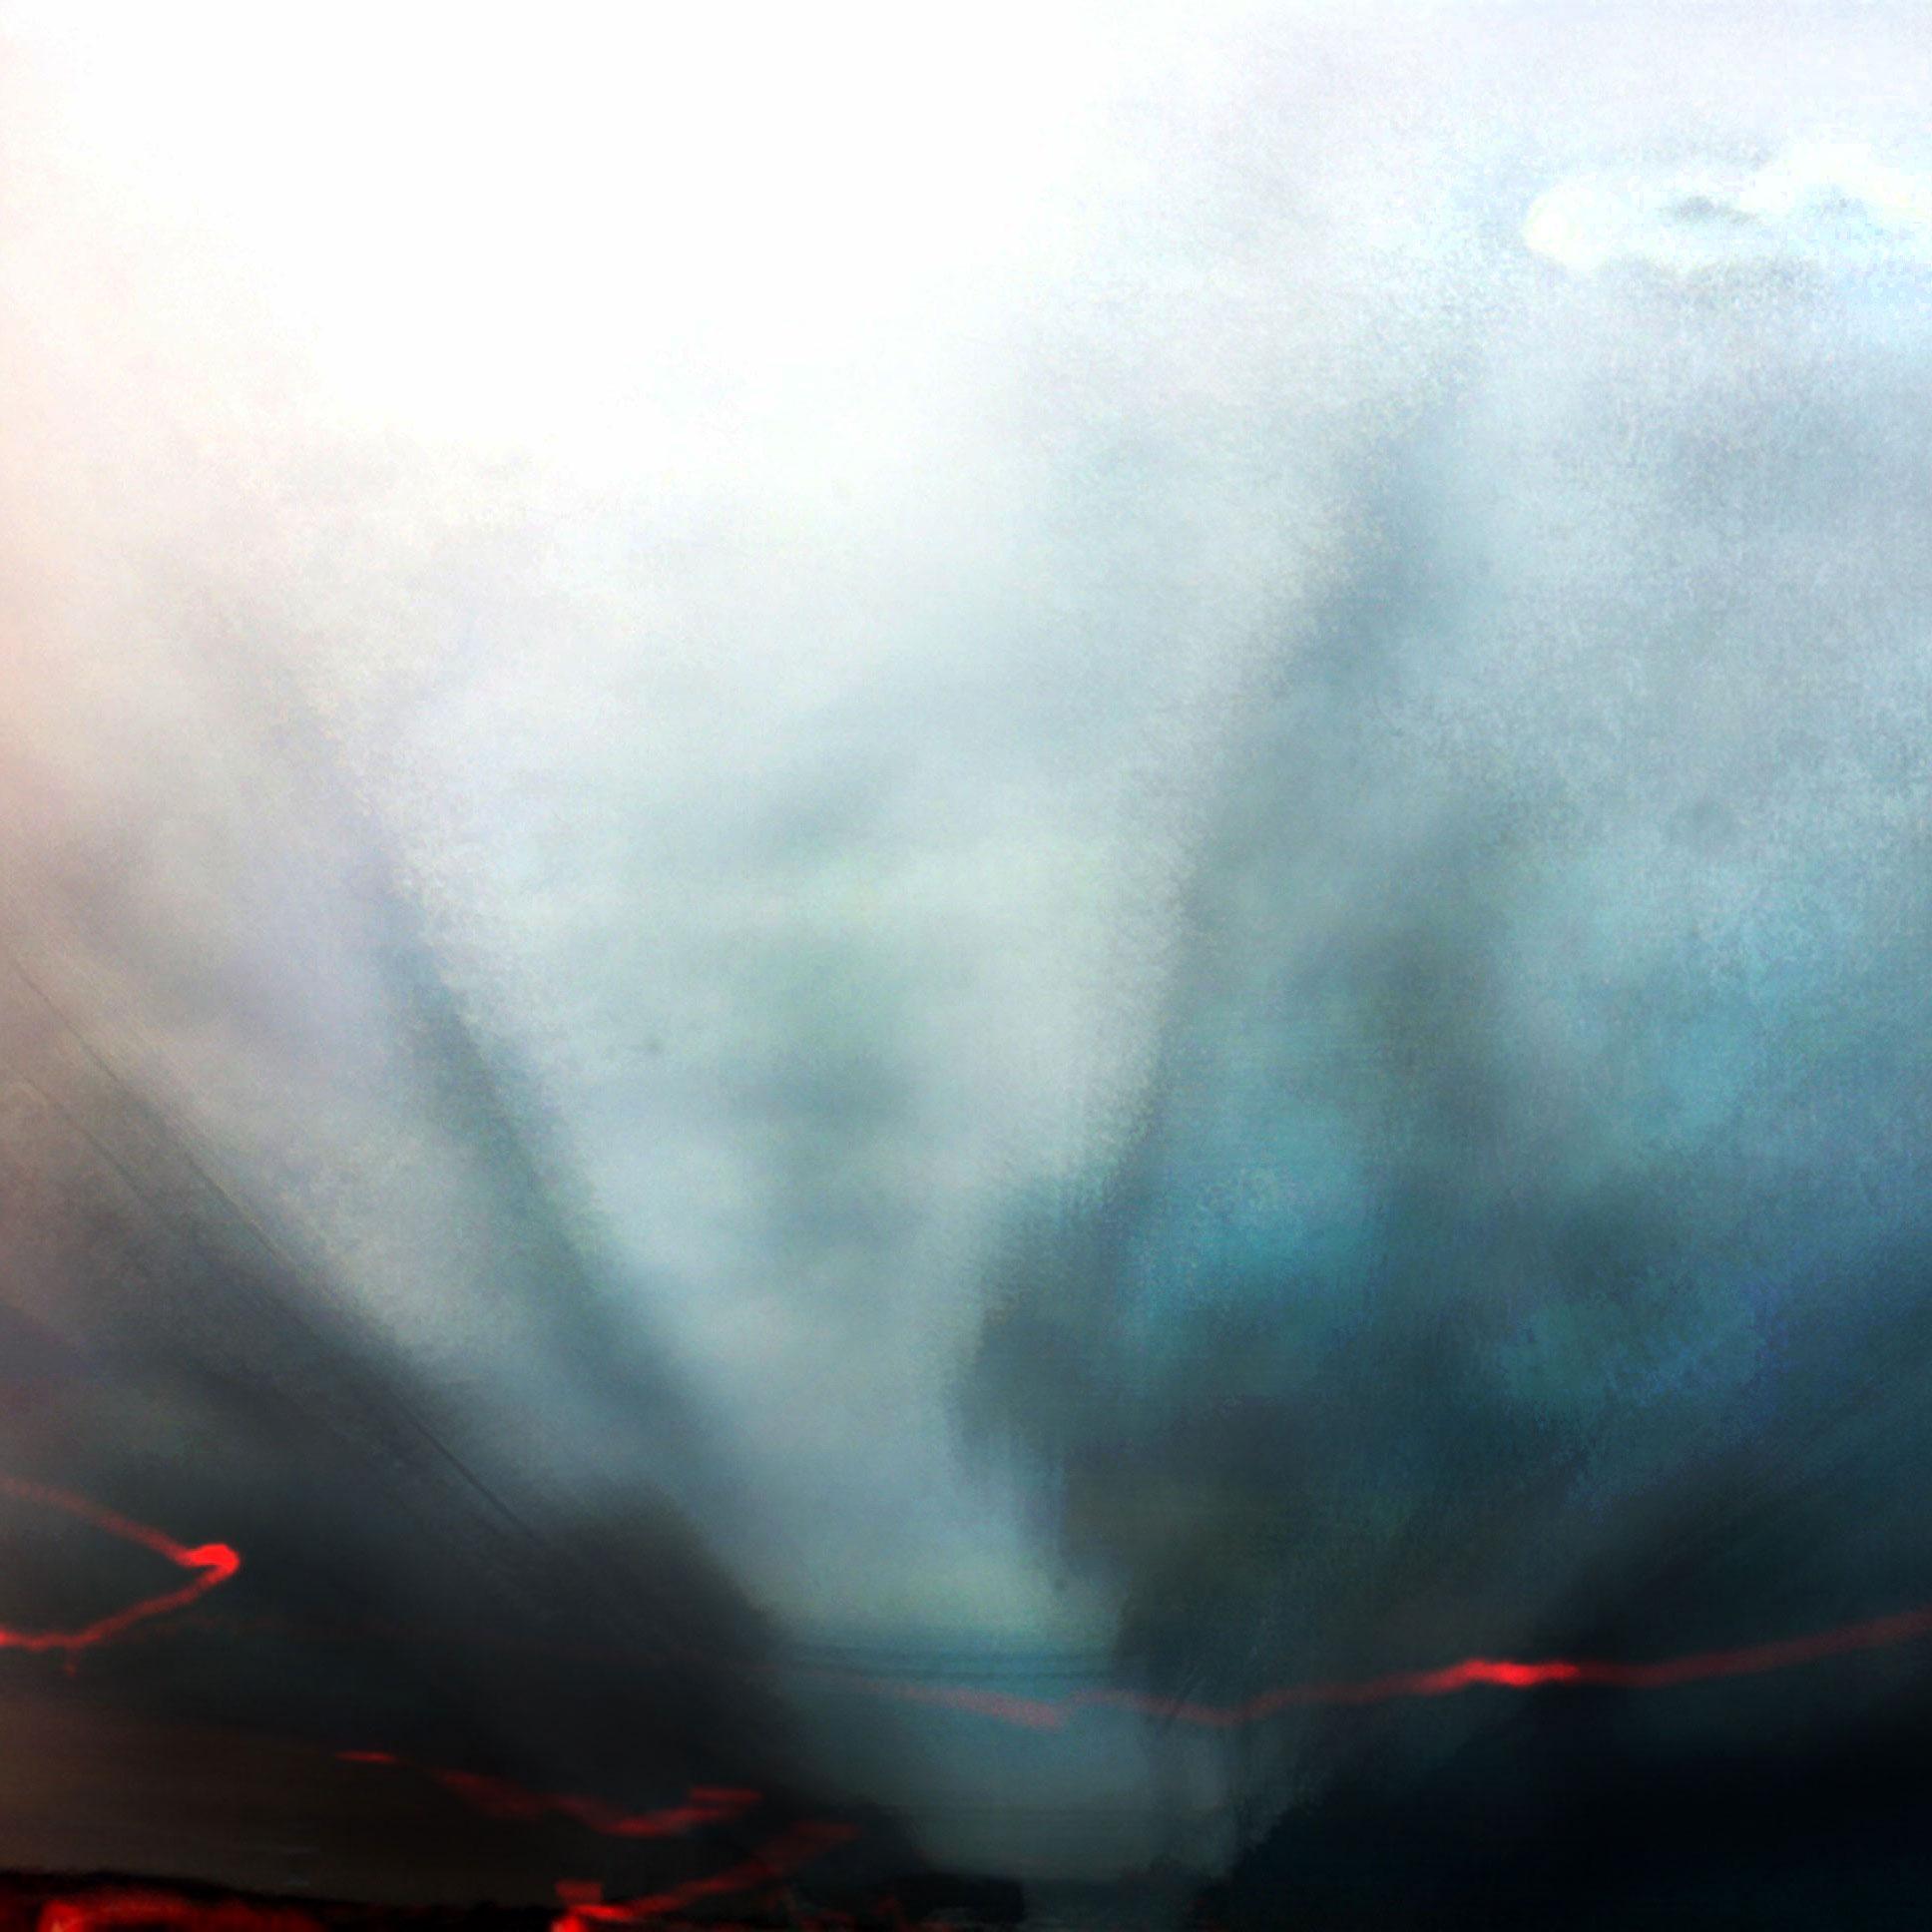 downhill-with-tail-lights-IMG_8896-sq.jpg